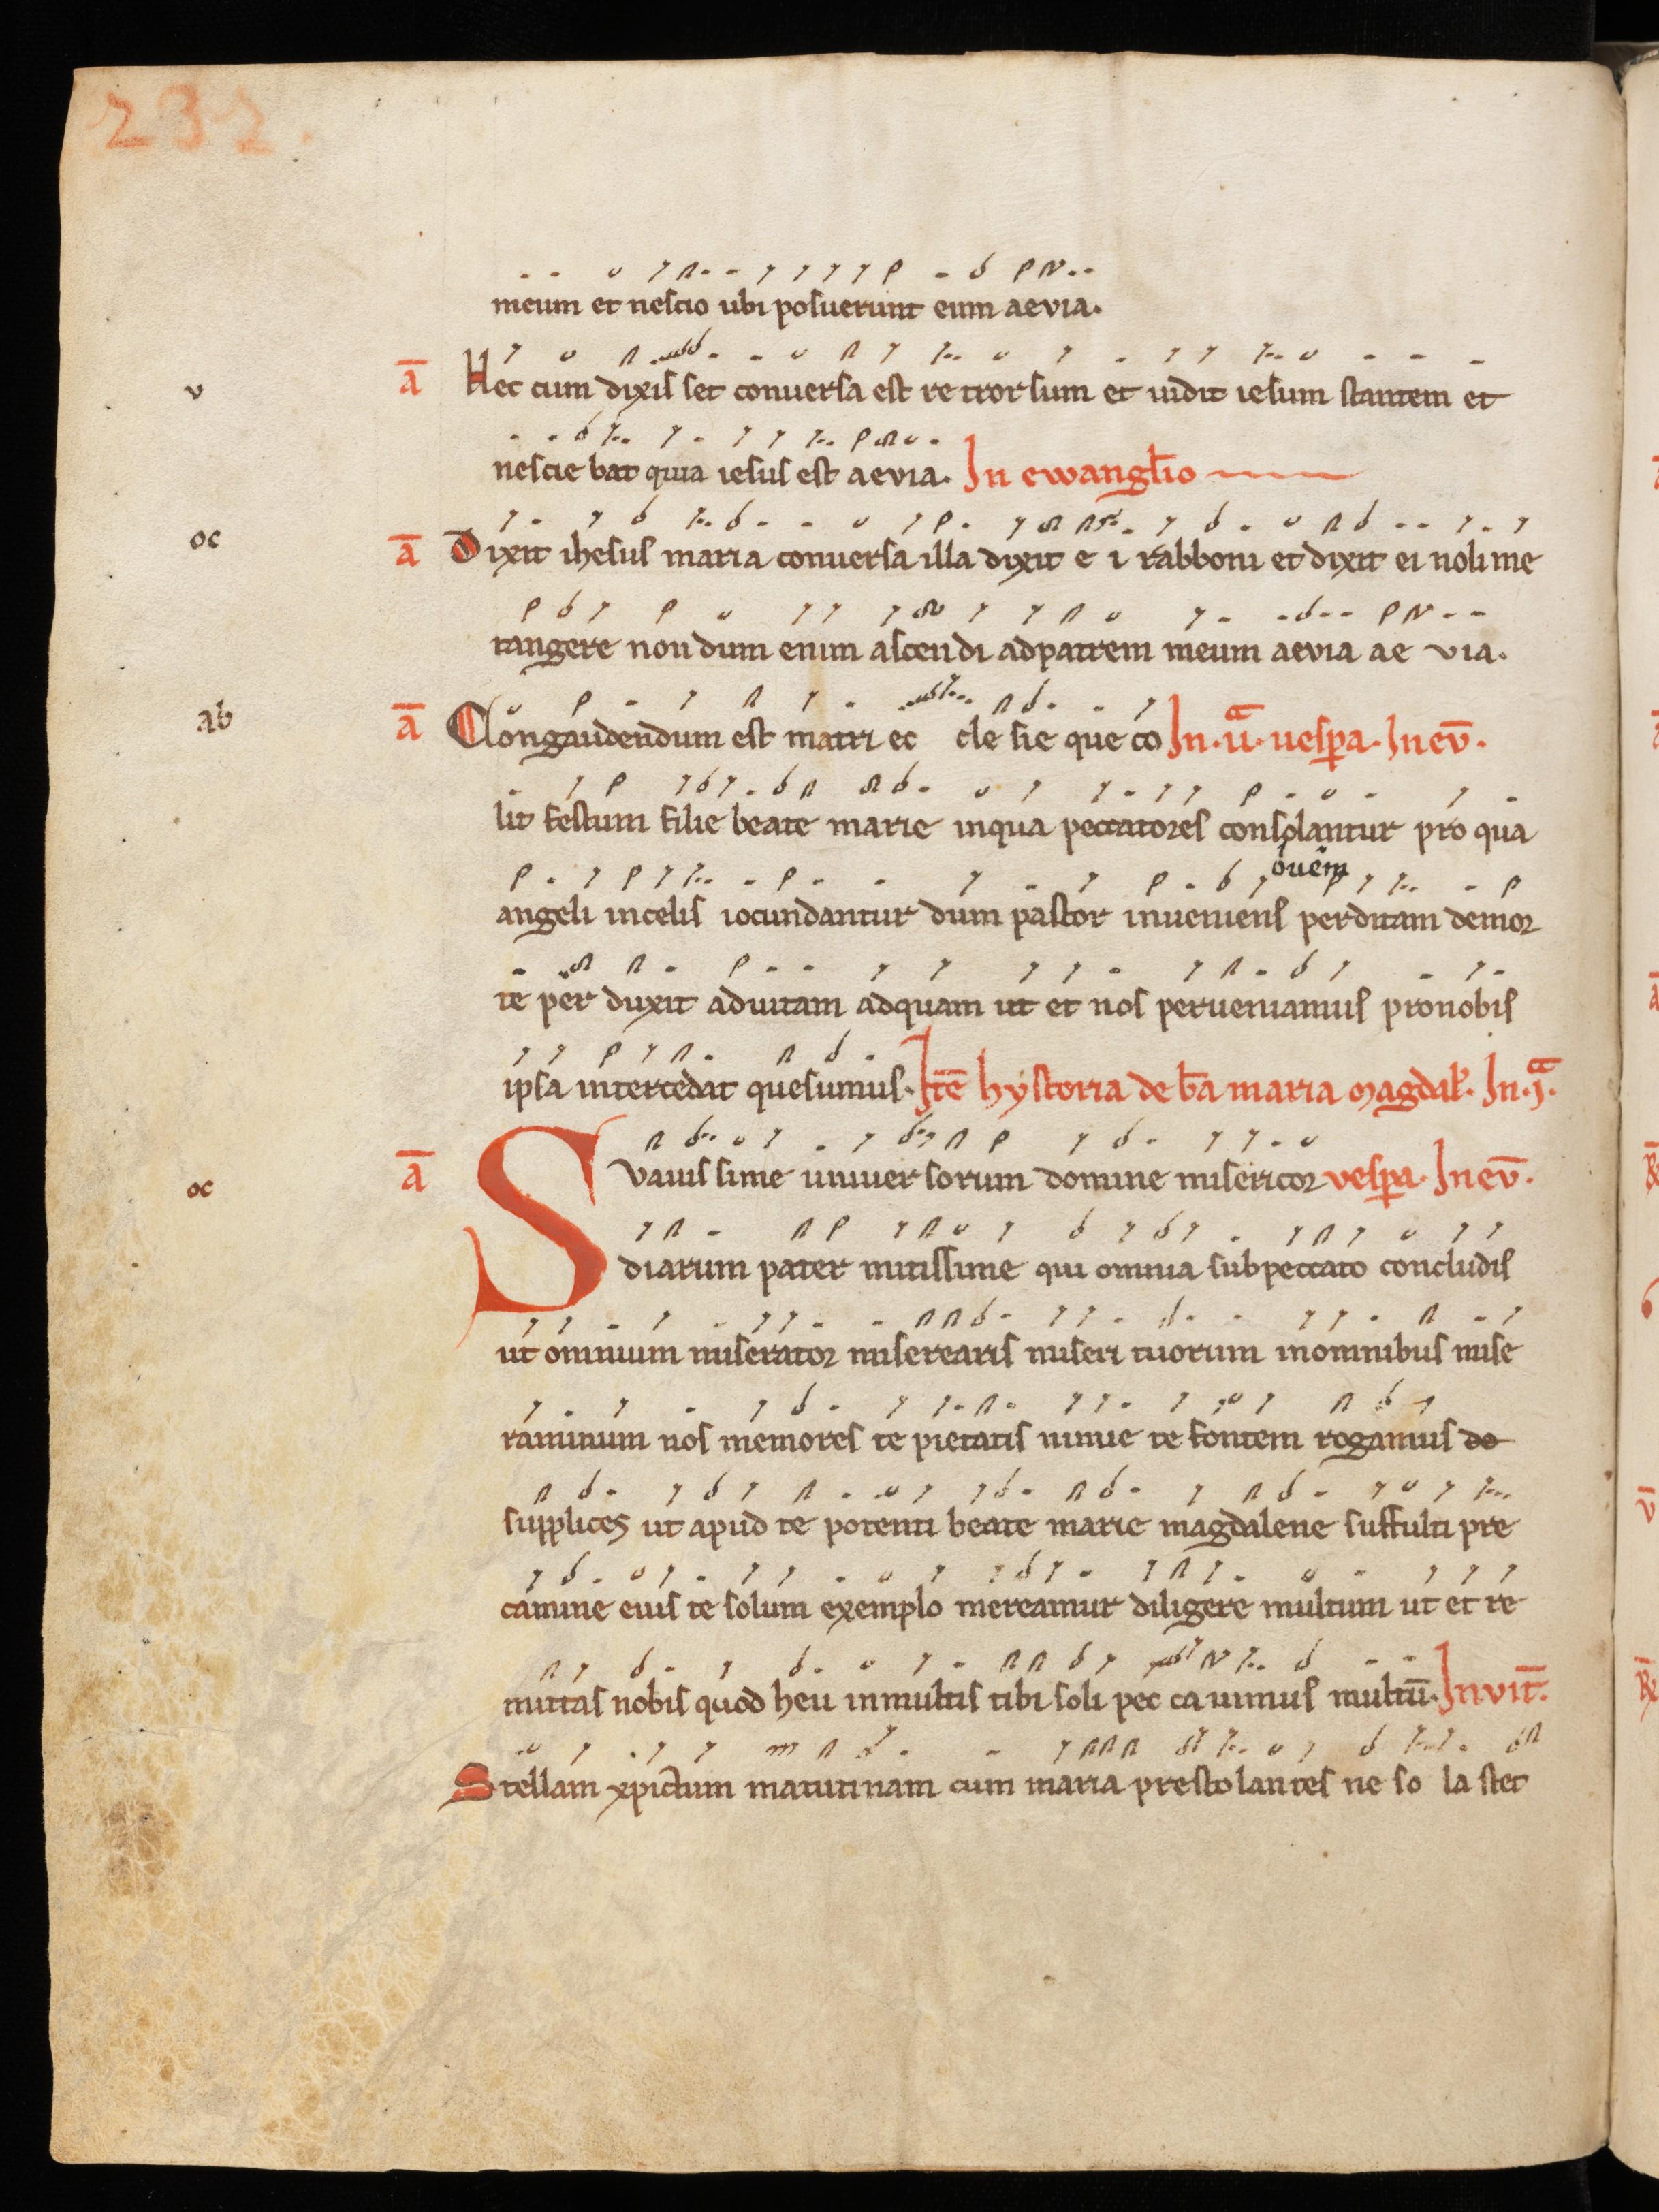 Beginning of Suavissime universorum Domine within the manuscript St. Gallen, Stiftsbibl., Cod. Sang. 389, p. 232.